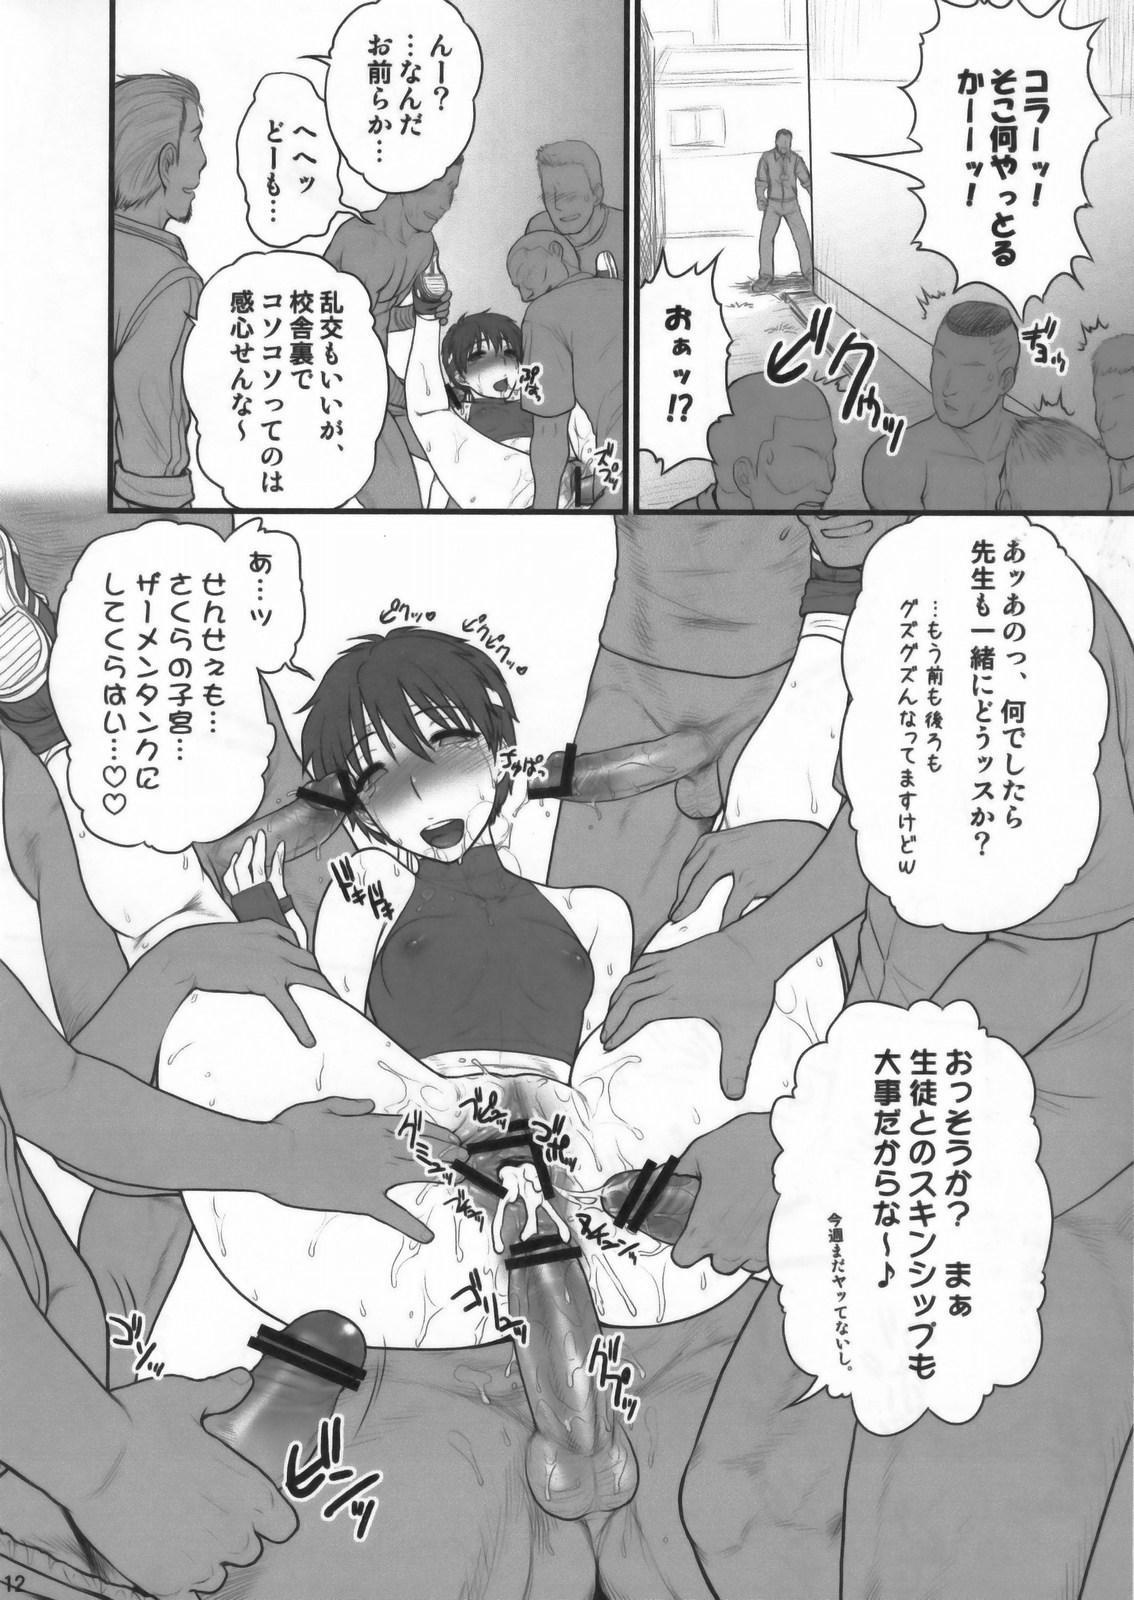 Sakura iro 11